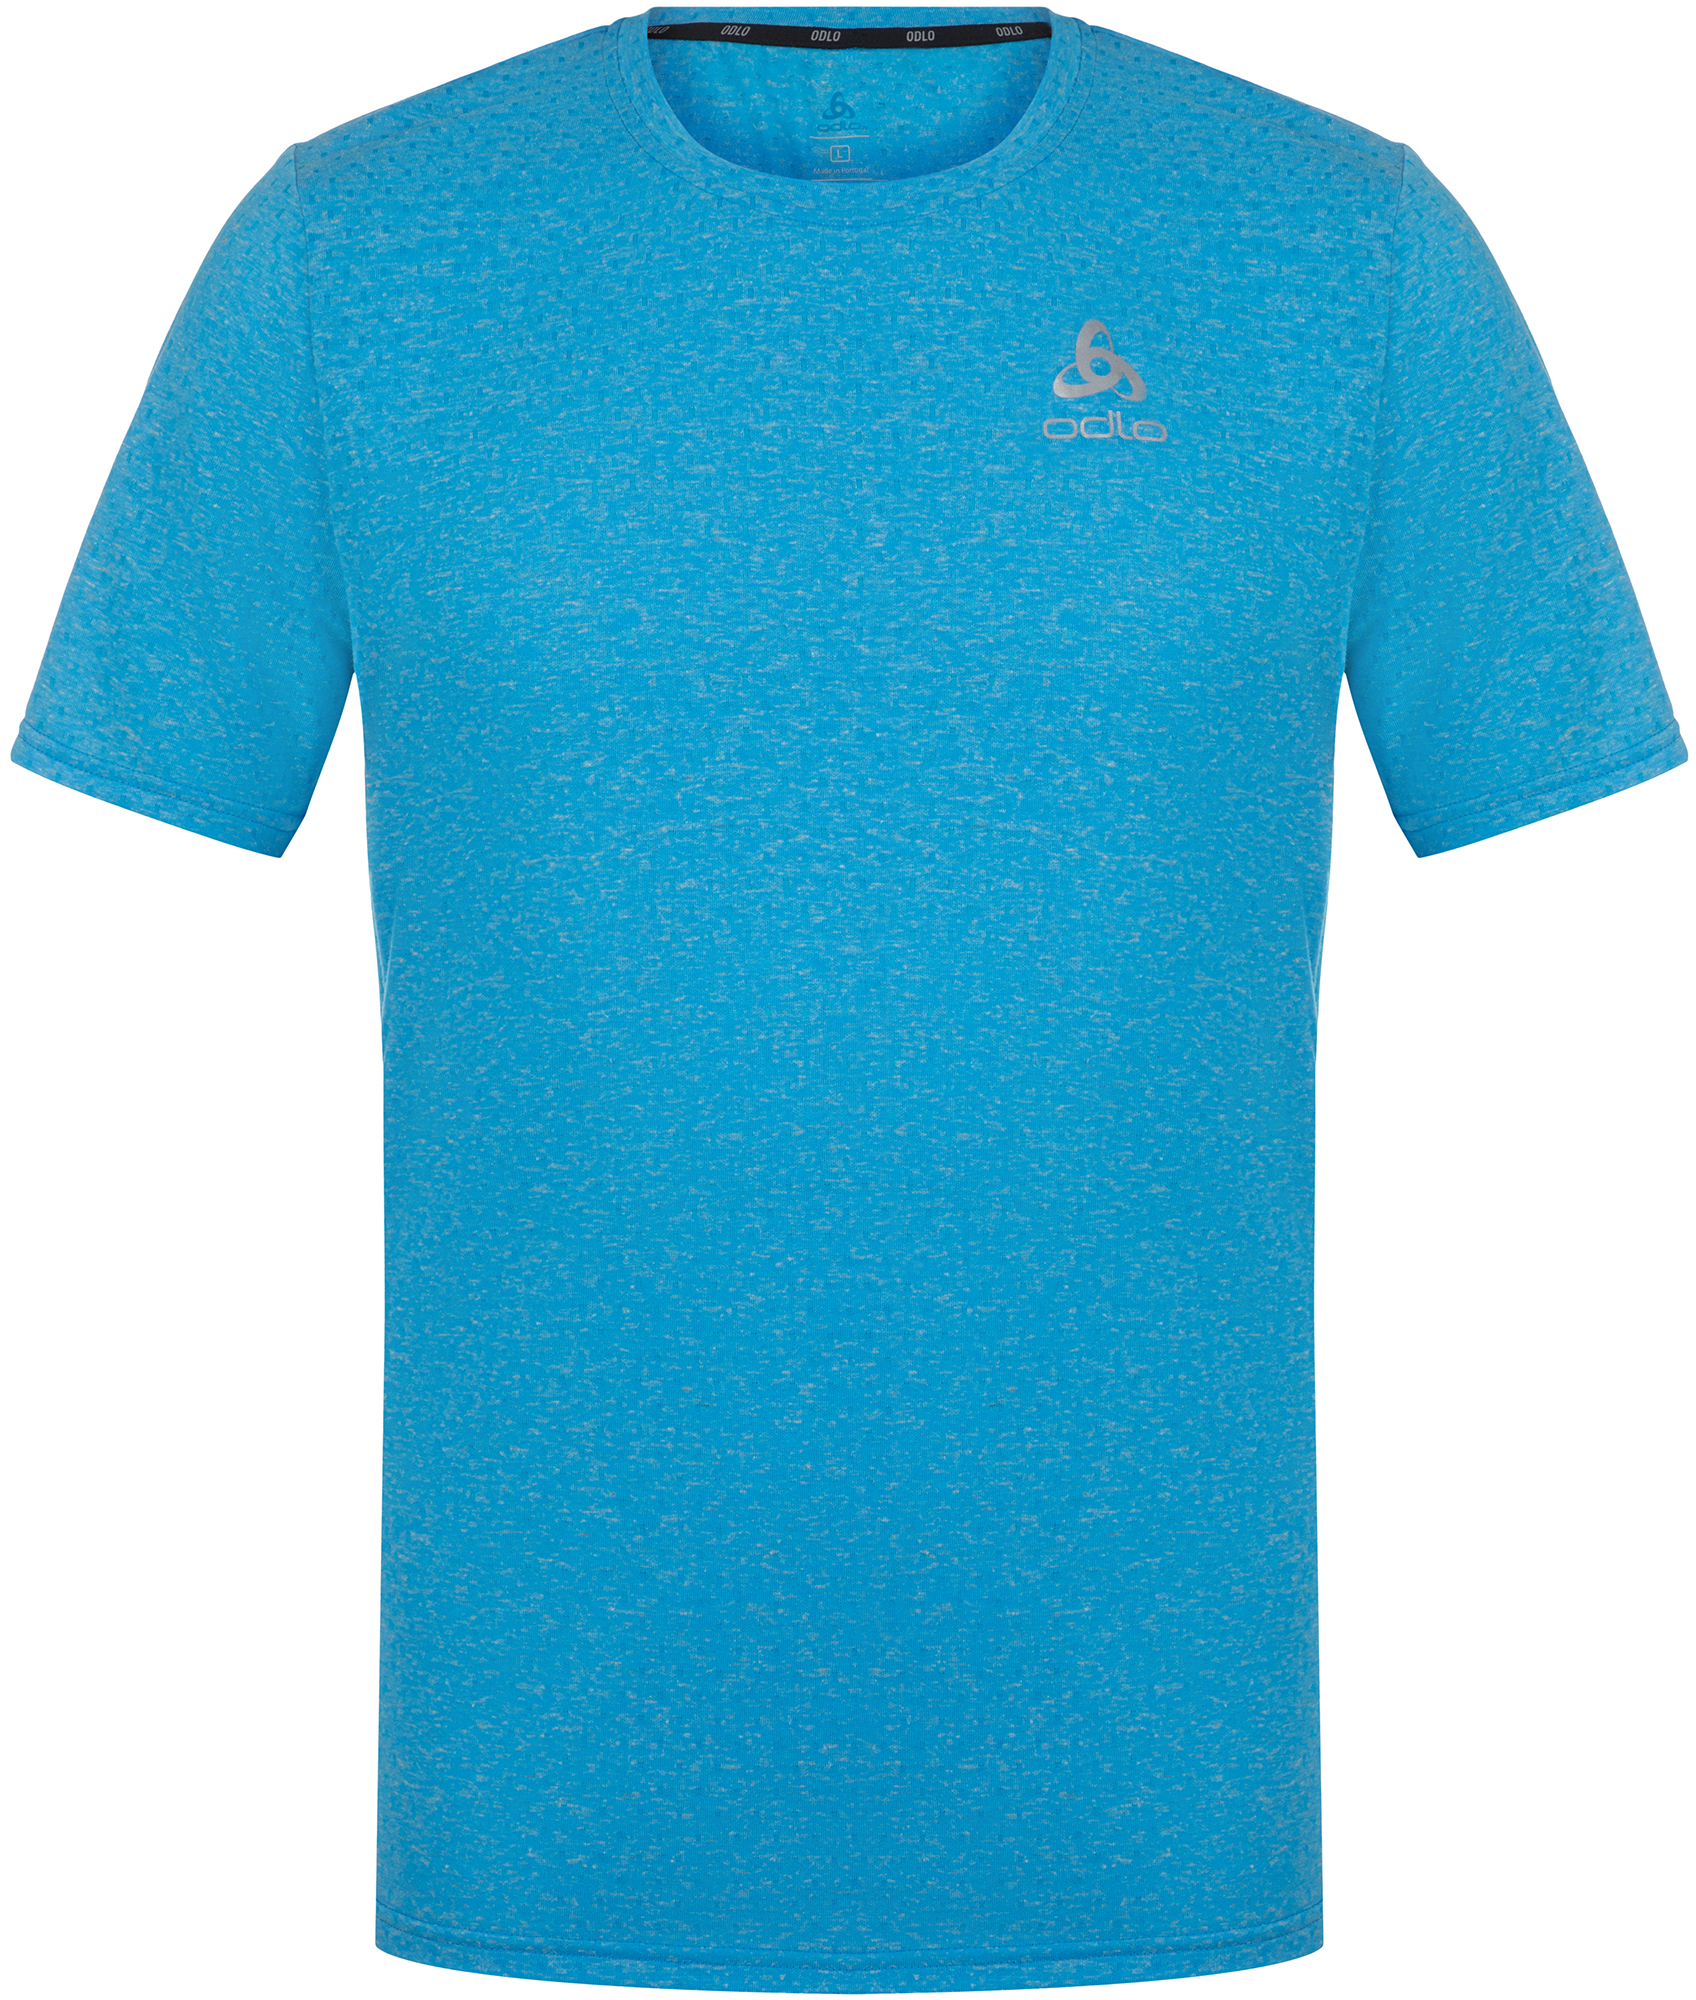 Odlo Футболка мужская Odlo Millennium, размер 48-50 odlo футболка женская odlo millennium размер 46 48